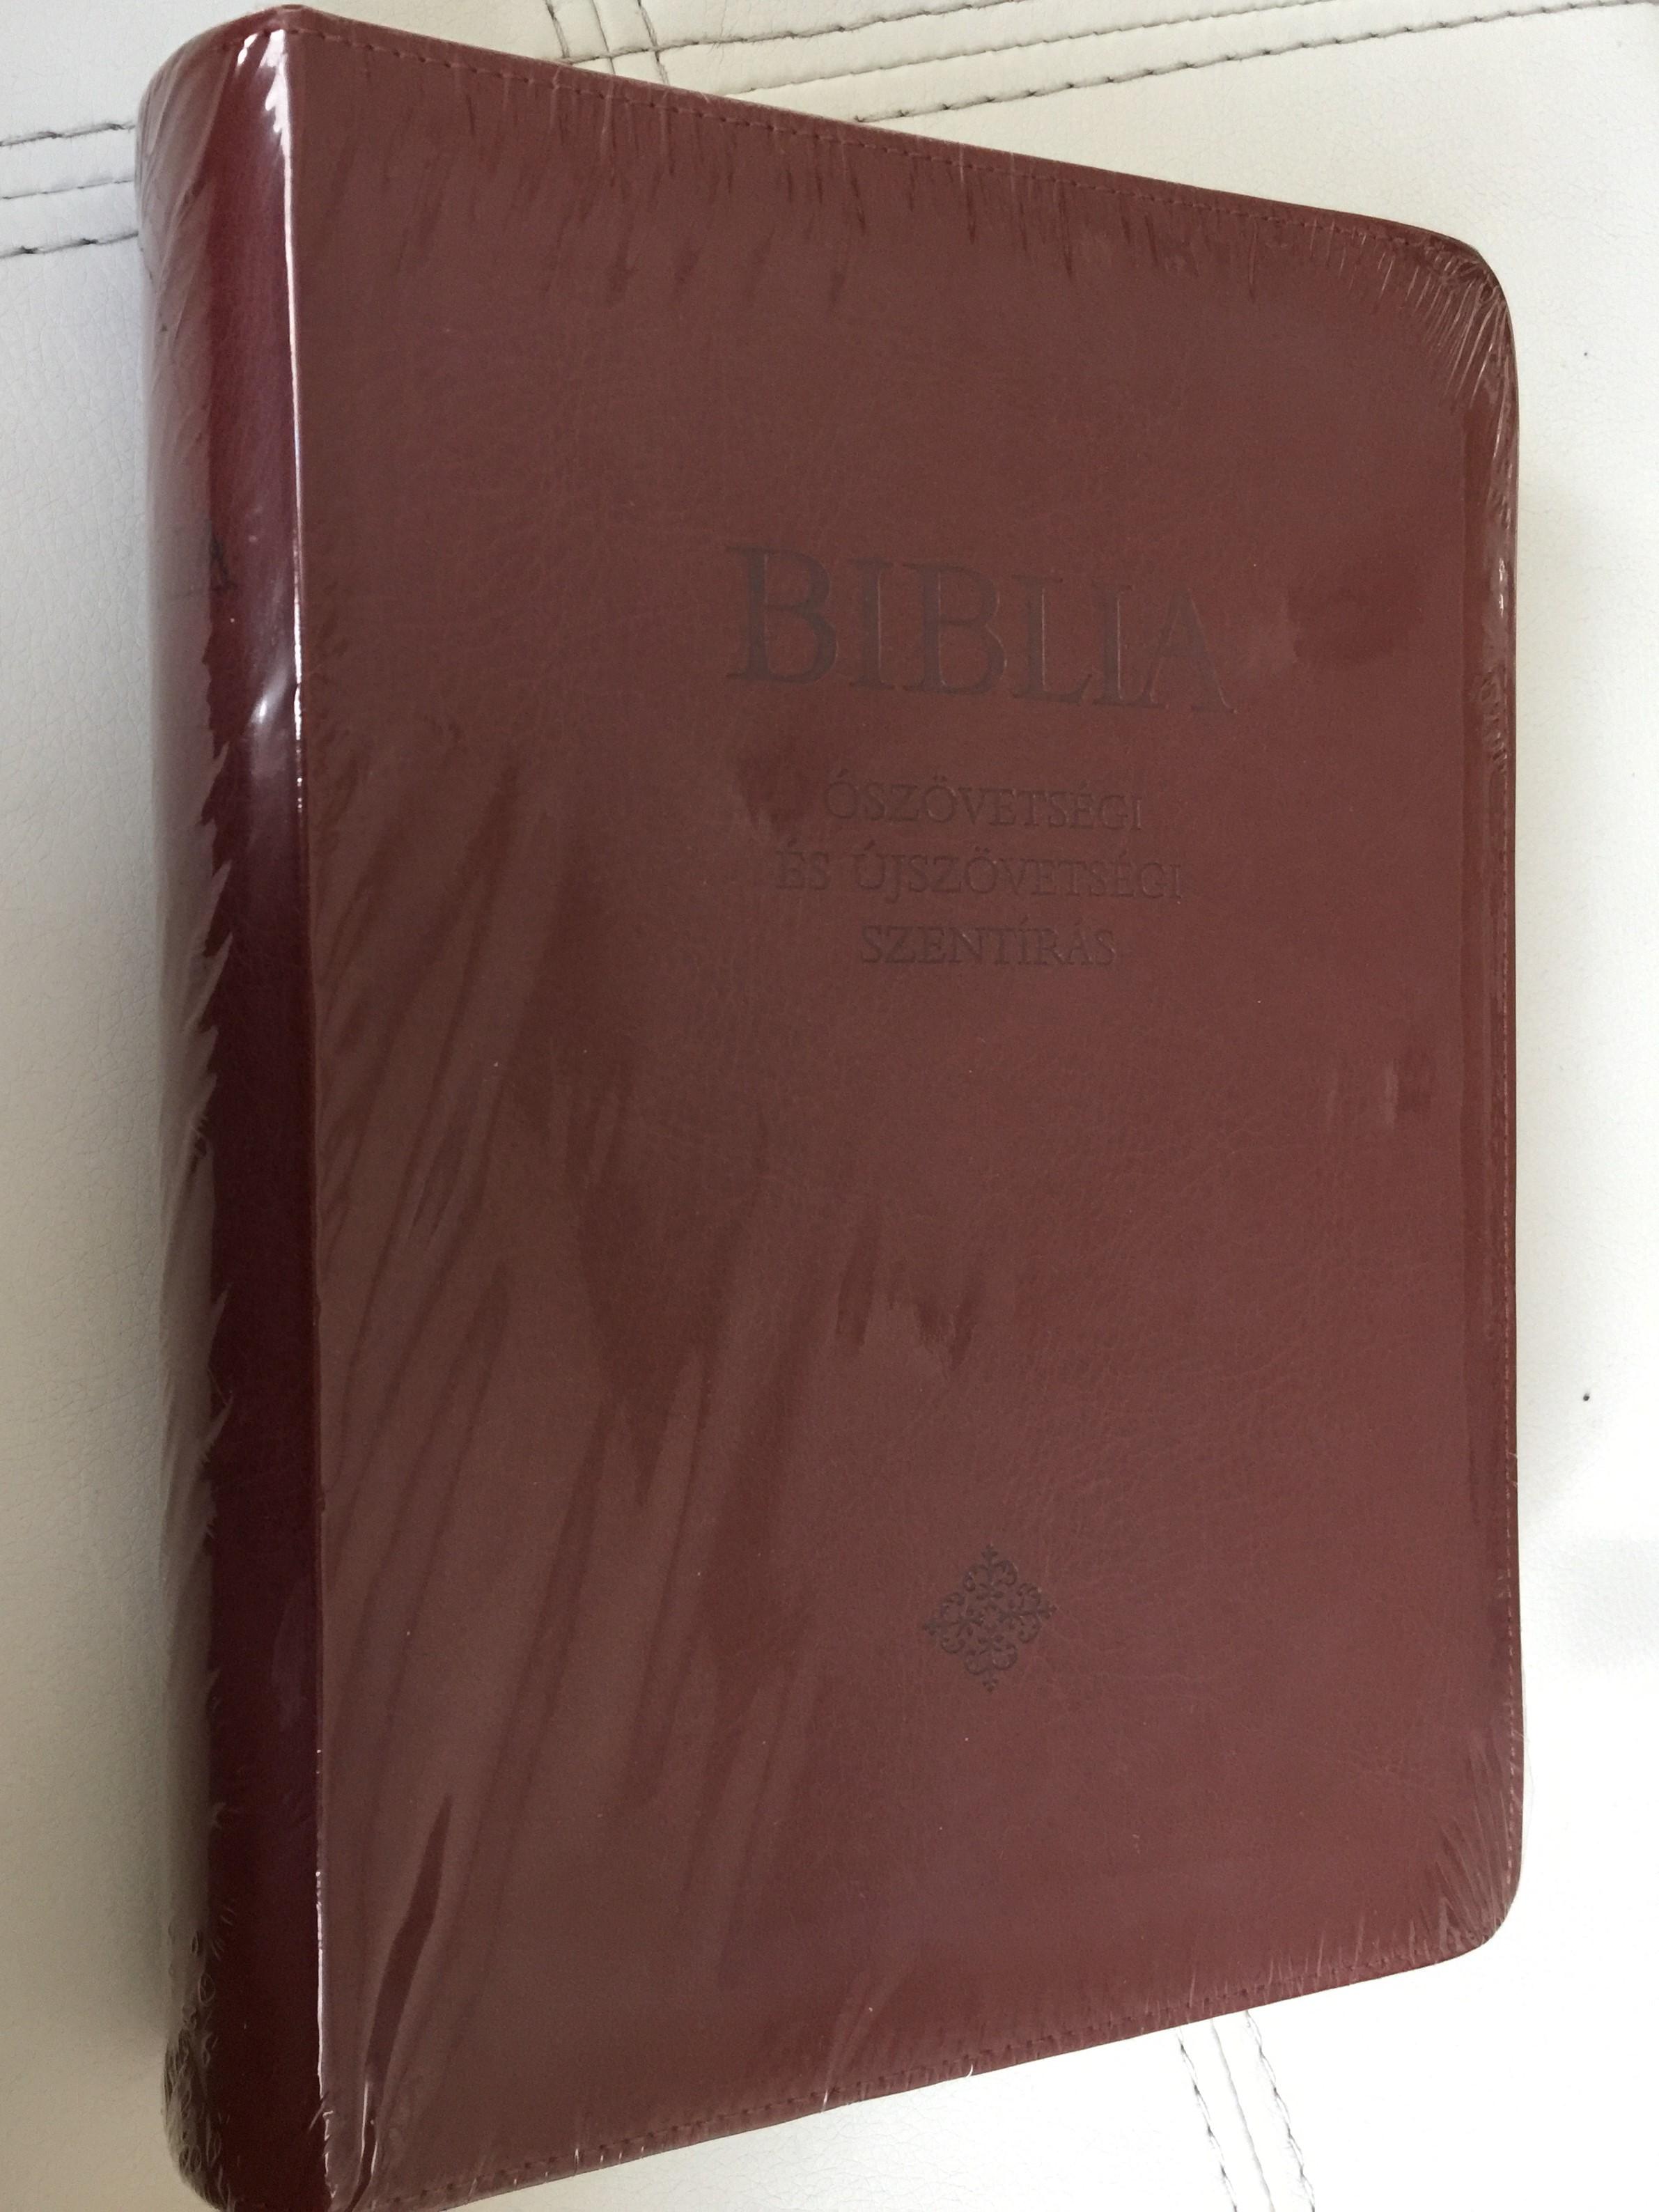 hungarian-large-print-catholic-family-bible-leather-bound-dark-brown-csal-di-biblia-1.jpg